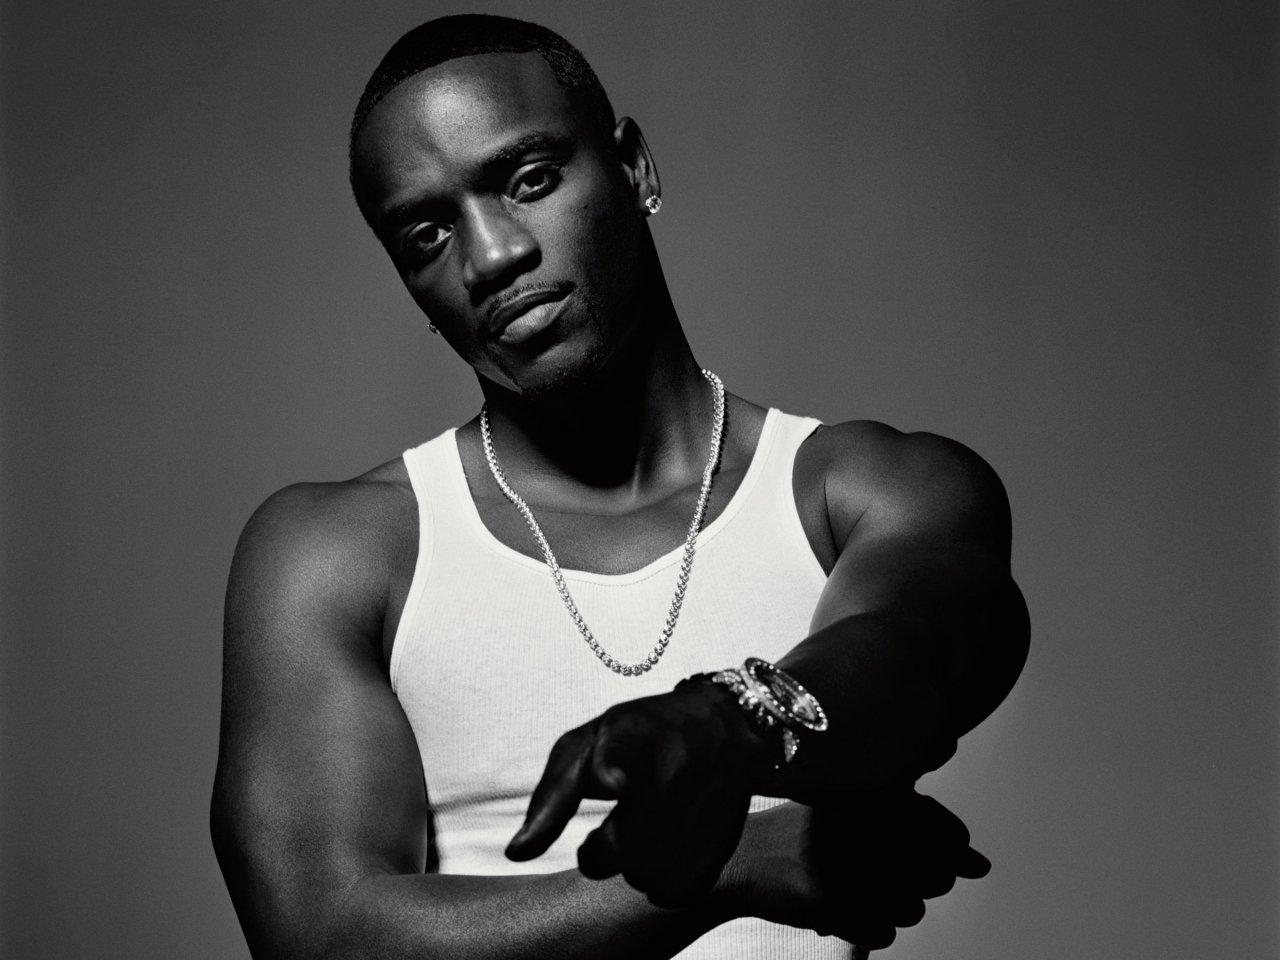 http://4.bp.blogspot.com/-R_f9KPO5VQg/TsppGAQvmlI/AAAAAAAASAA/eN3tBEx2x9E/s1600/Akon-005.jpg